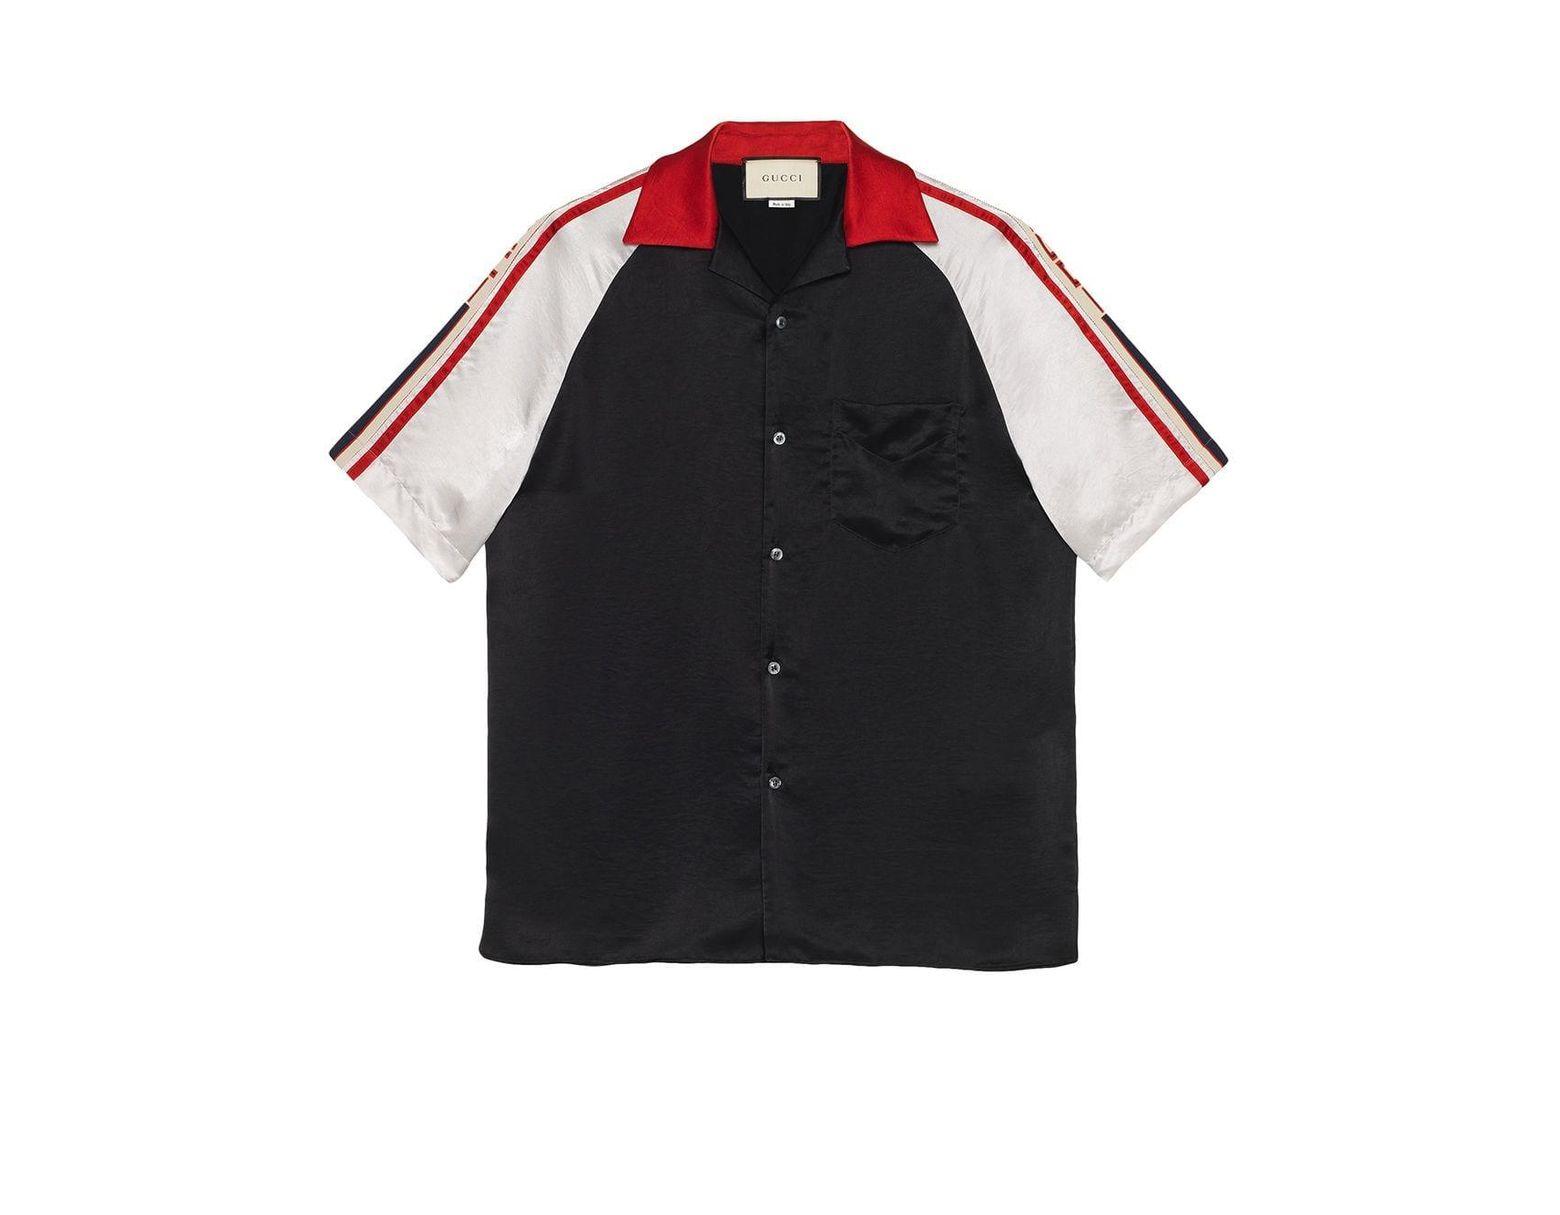 4d65533197 Men's Black Acetate Bowling Shirt With Stripe